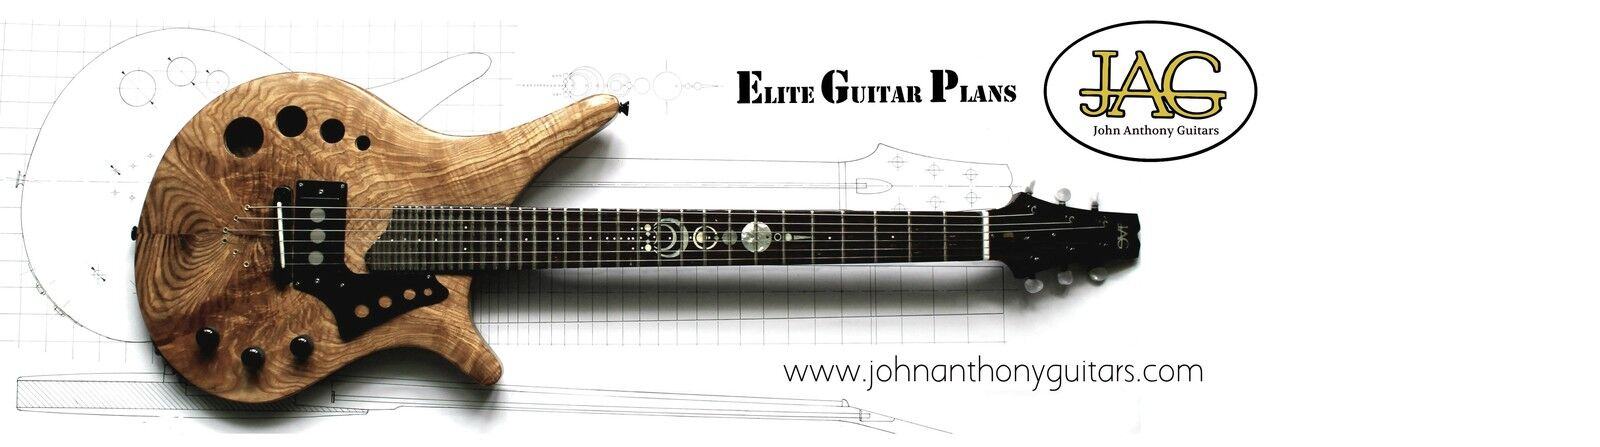 JAGuitars & Elite Guitar Plans